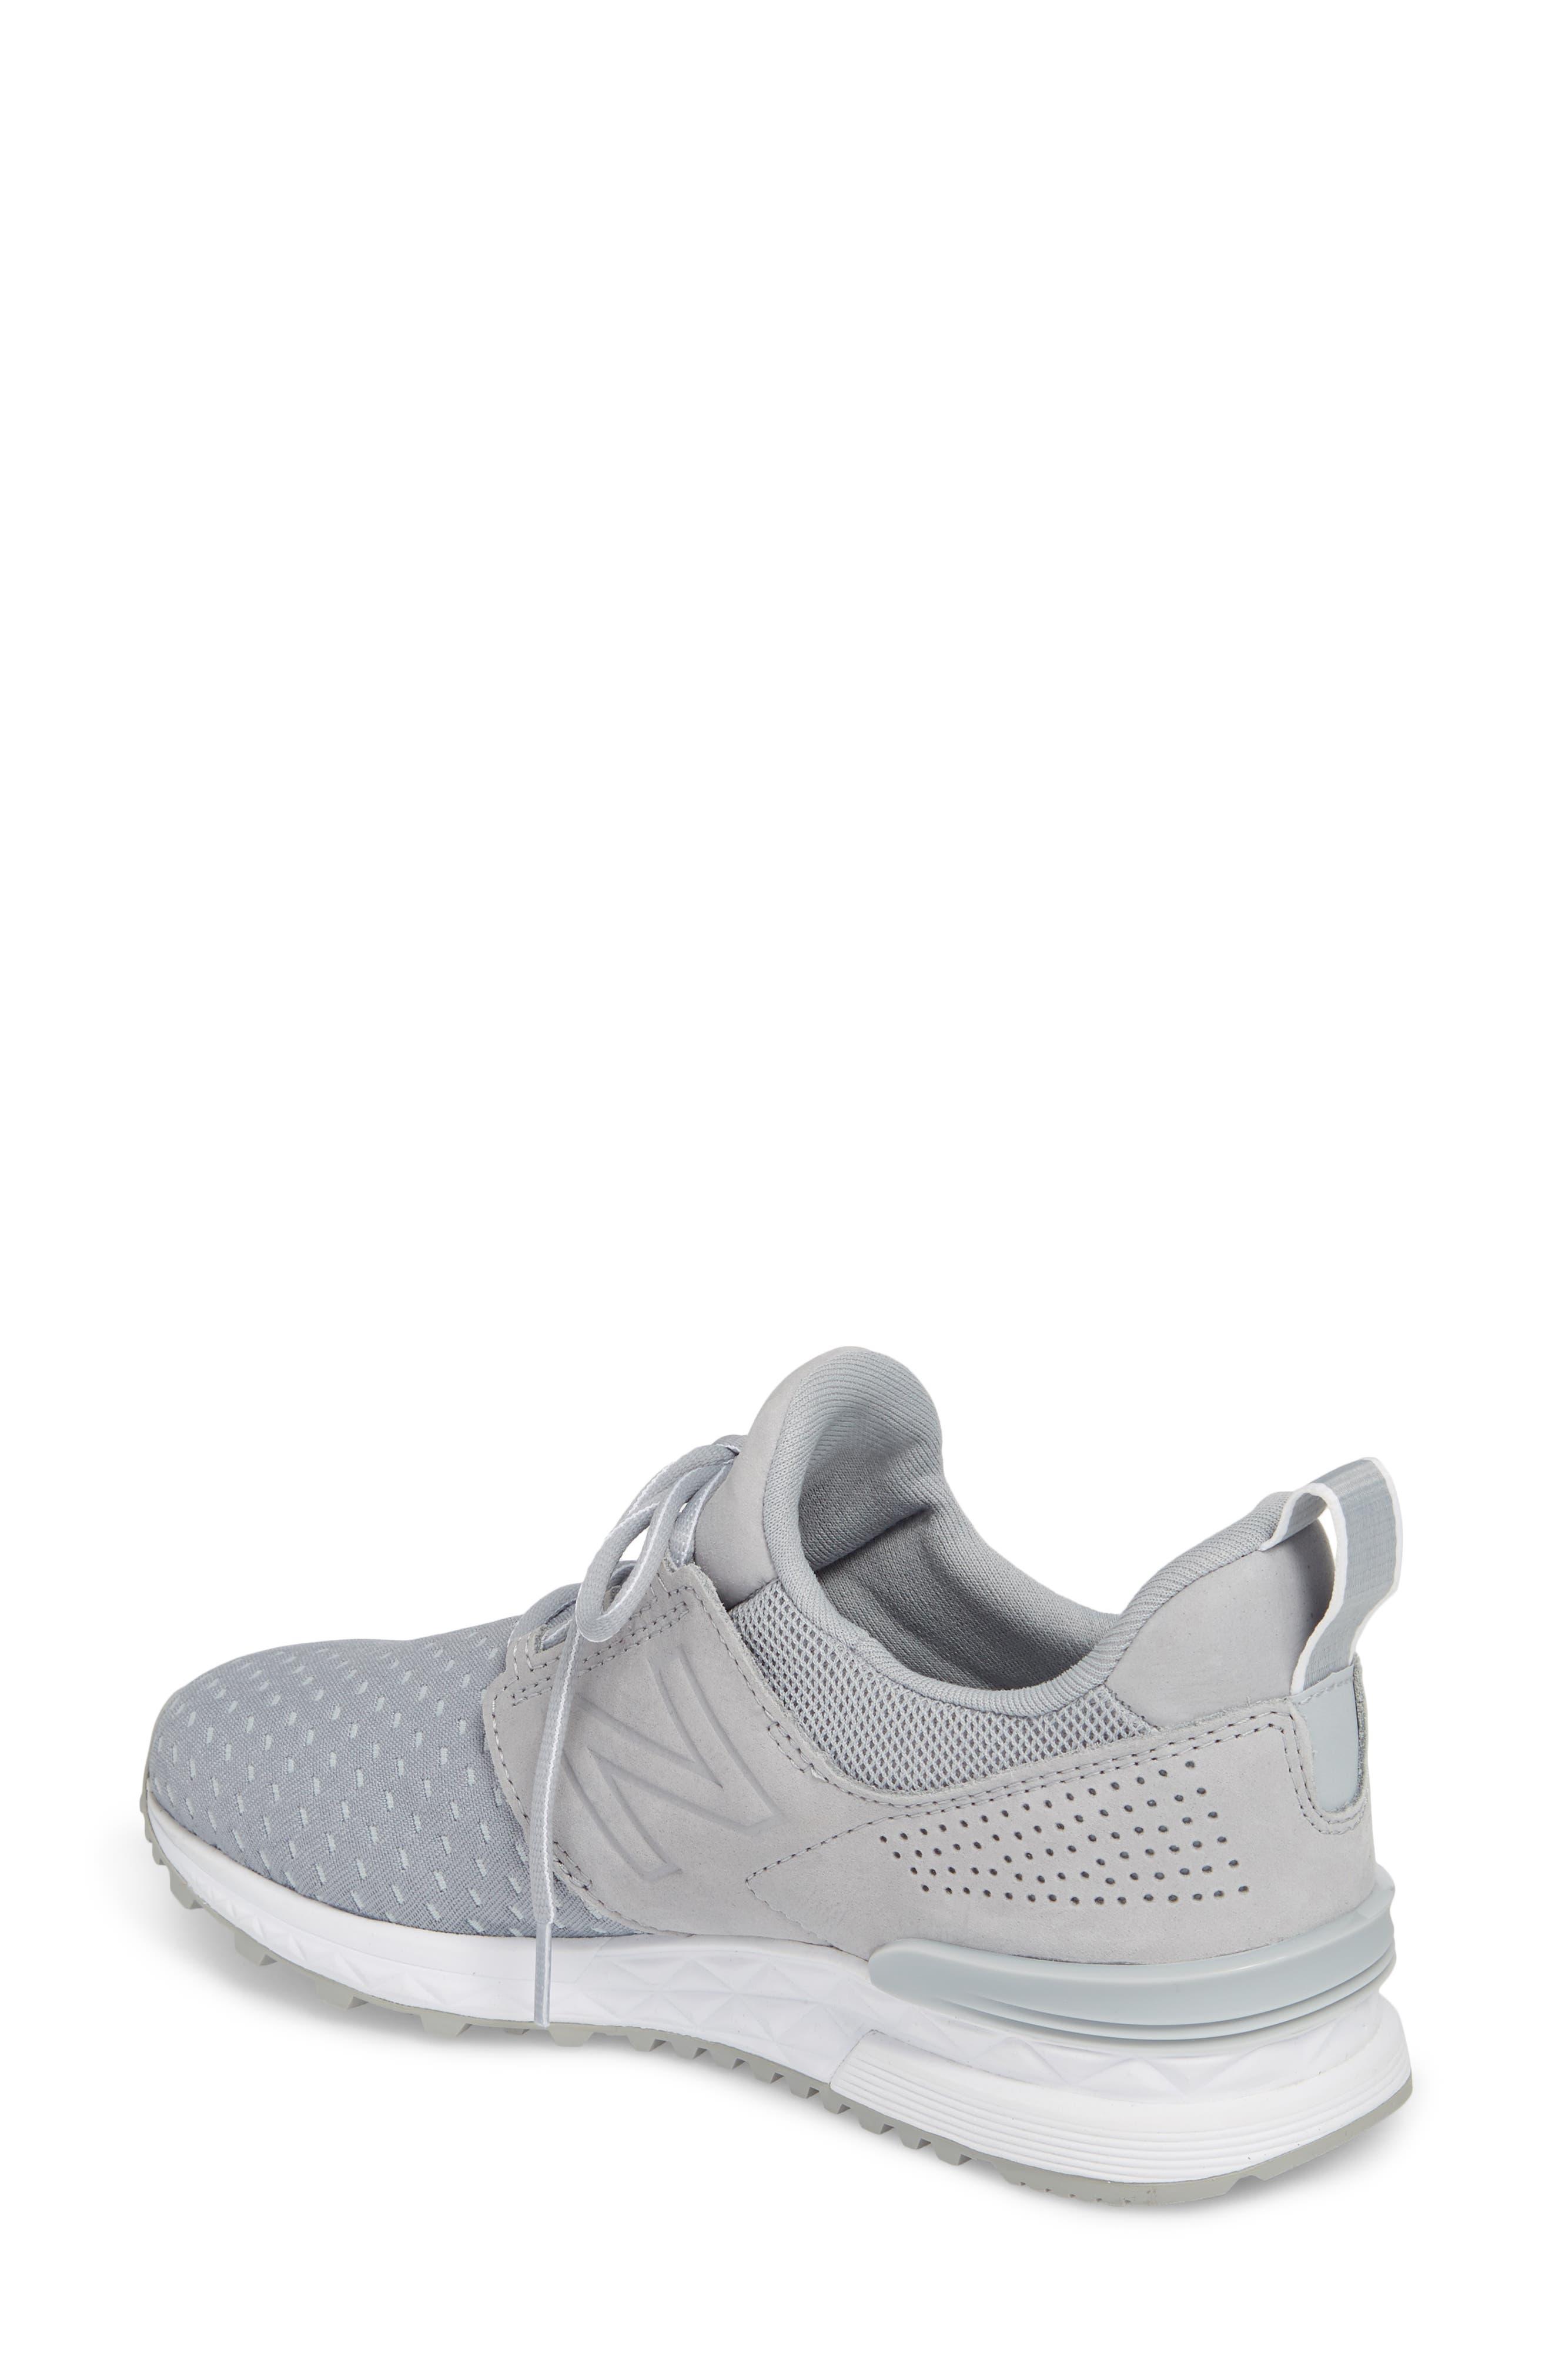 574 Sport Decon Fresh Foam Sneaker,                             Alternate thumbnail 2, color,                             097